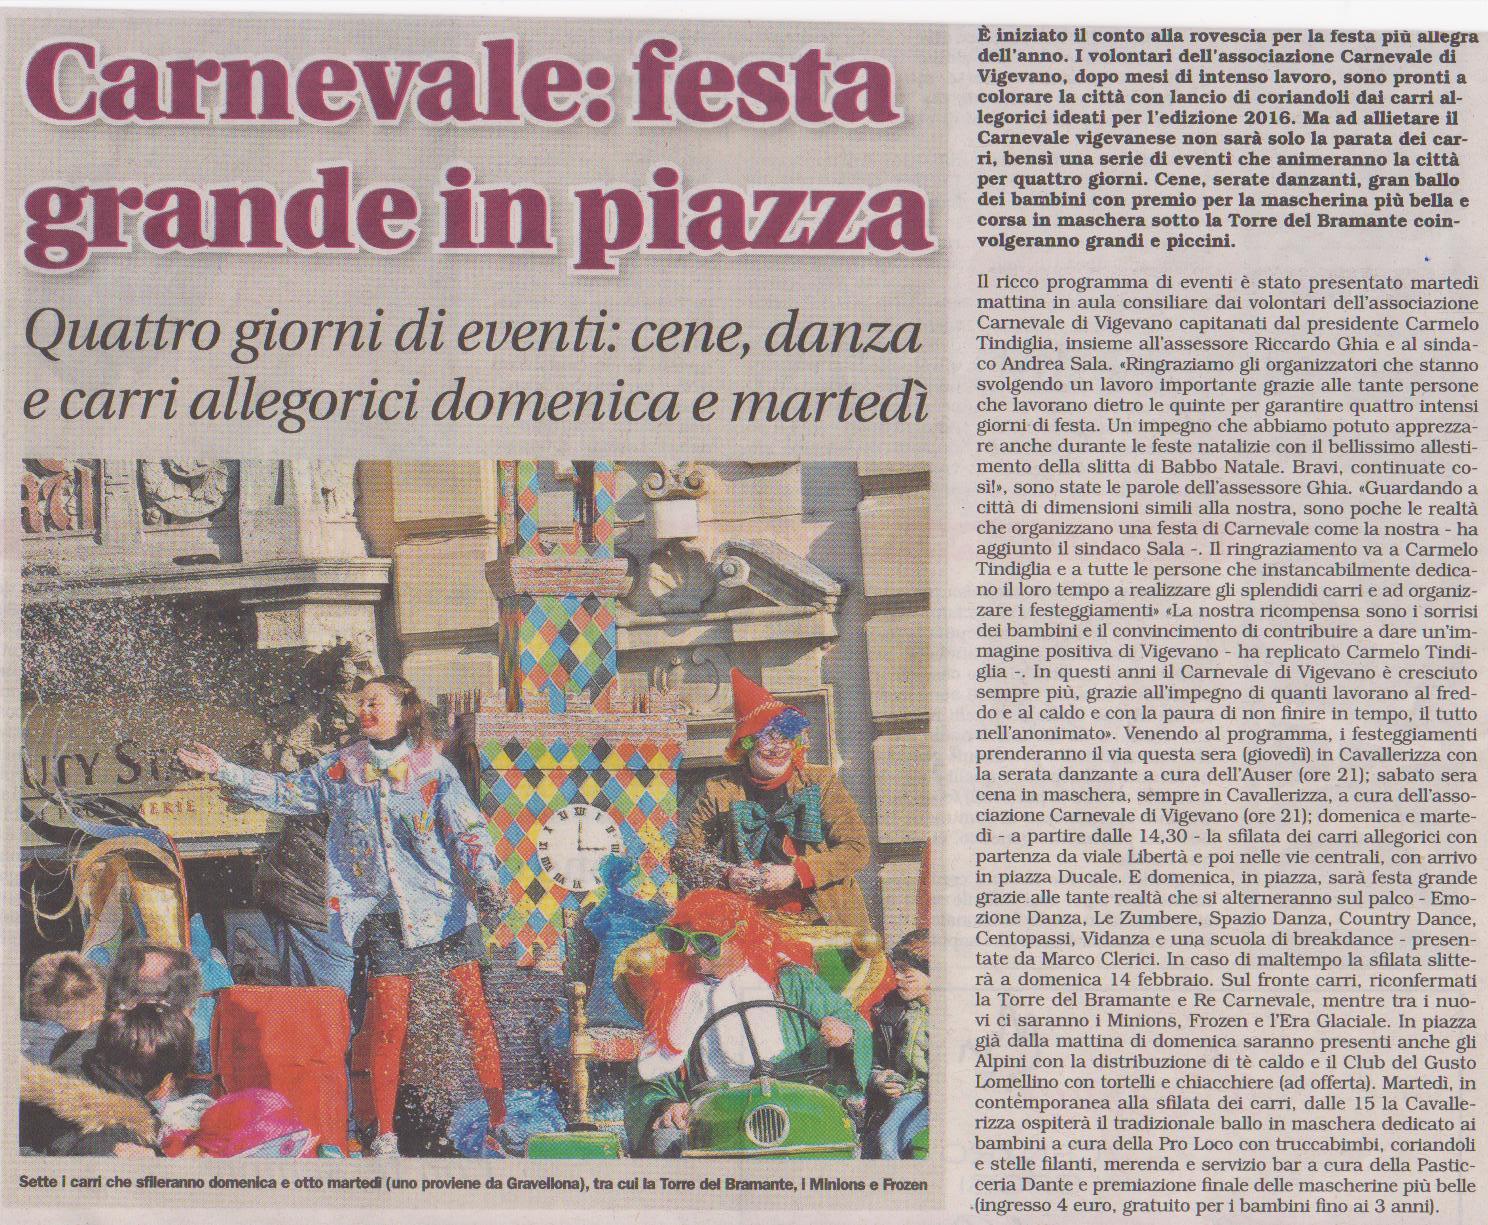 Carnevale Vigevano 2016